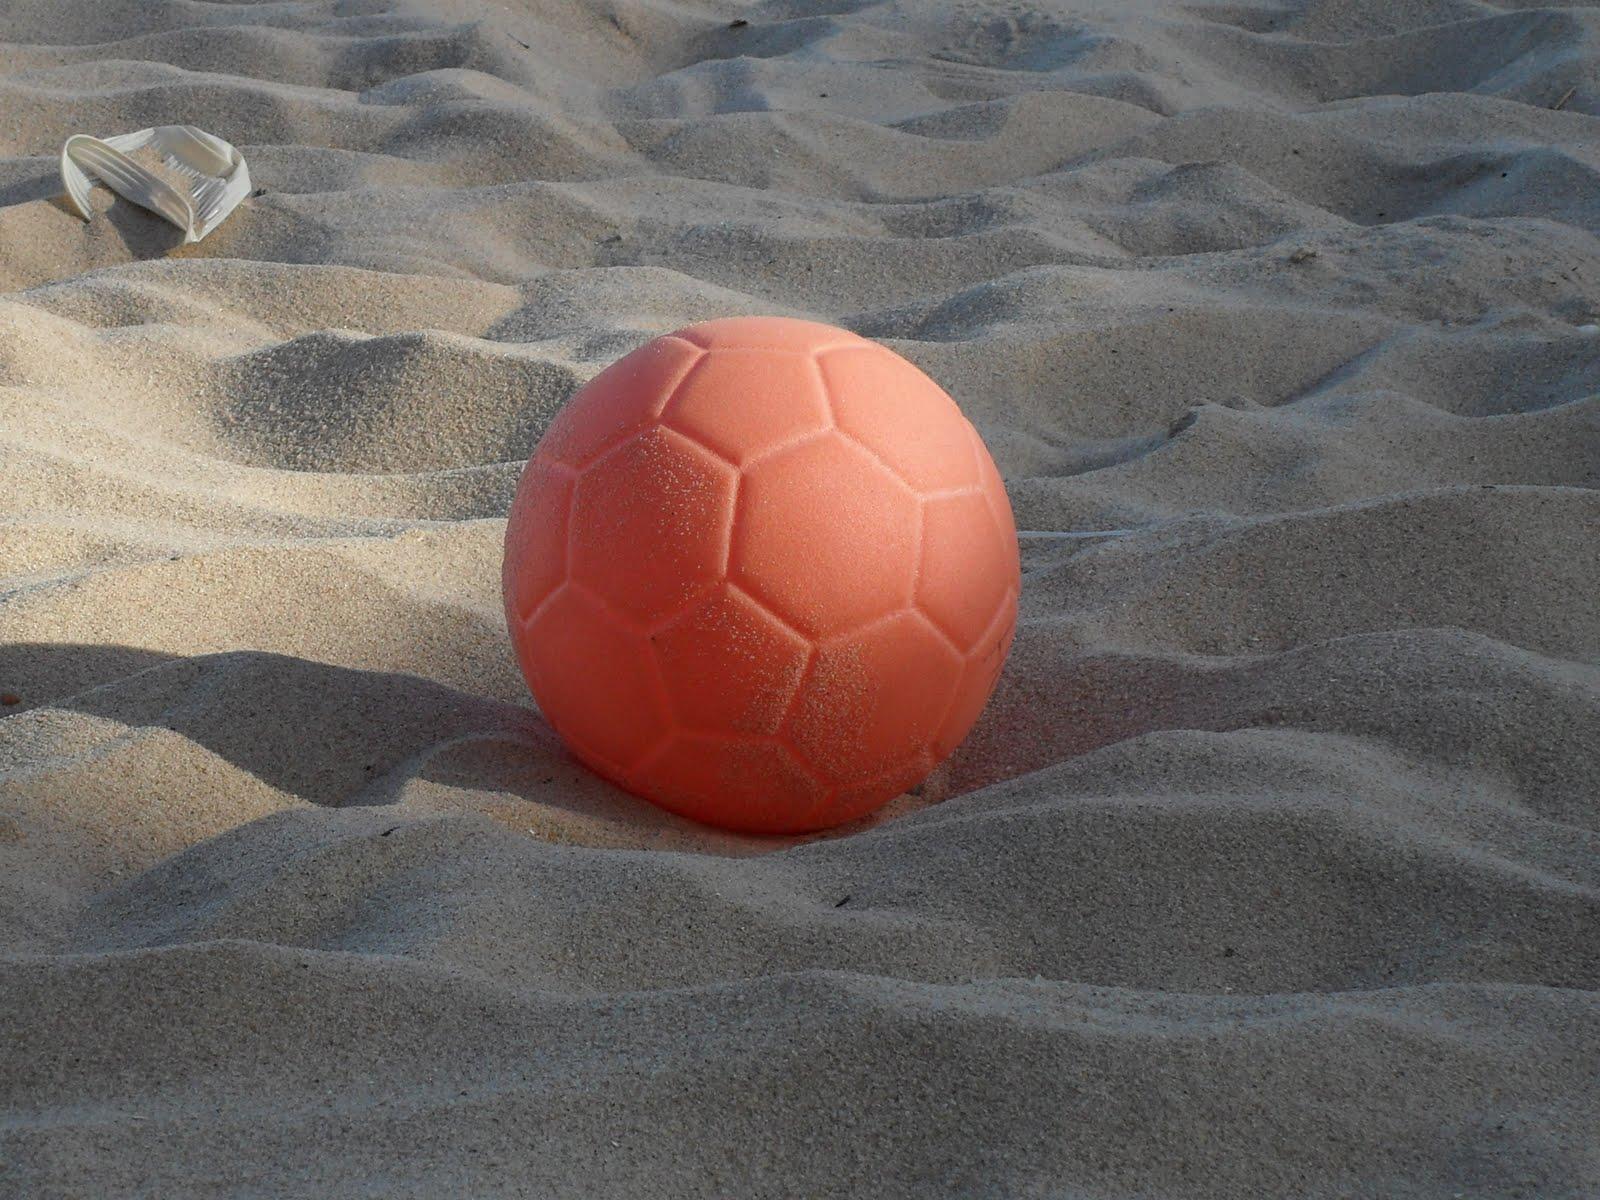 Bola do Handebol de Areia